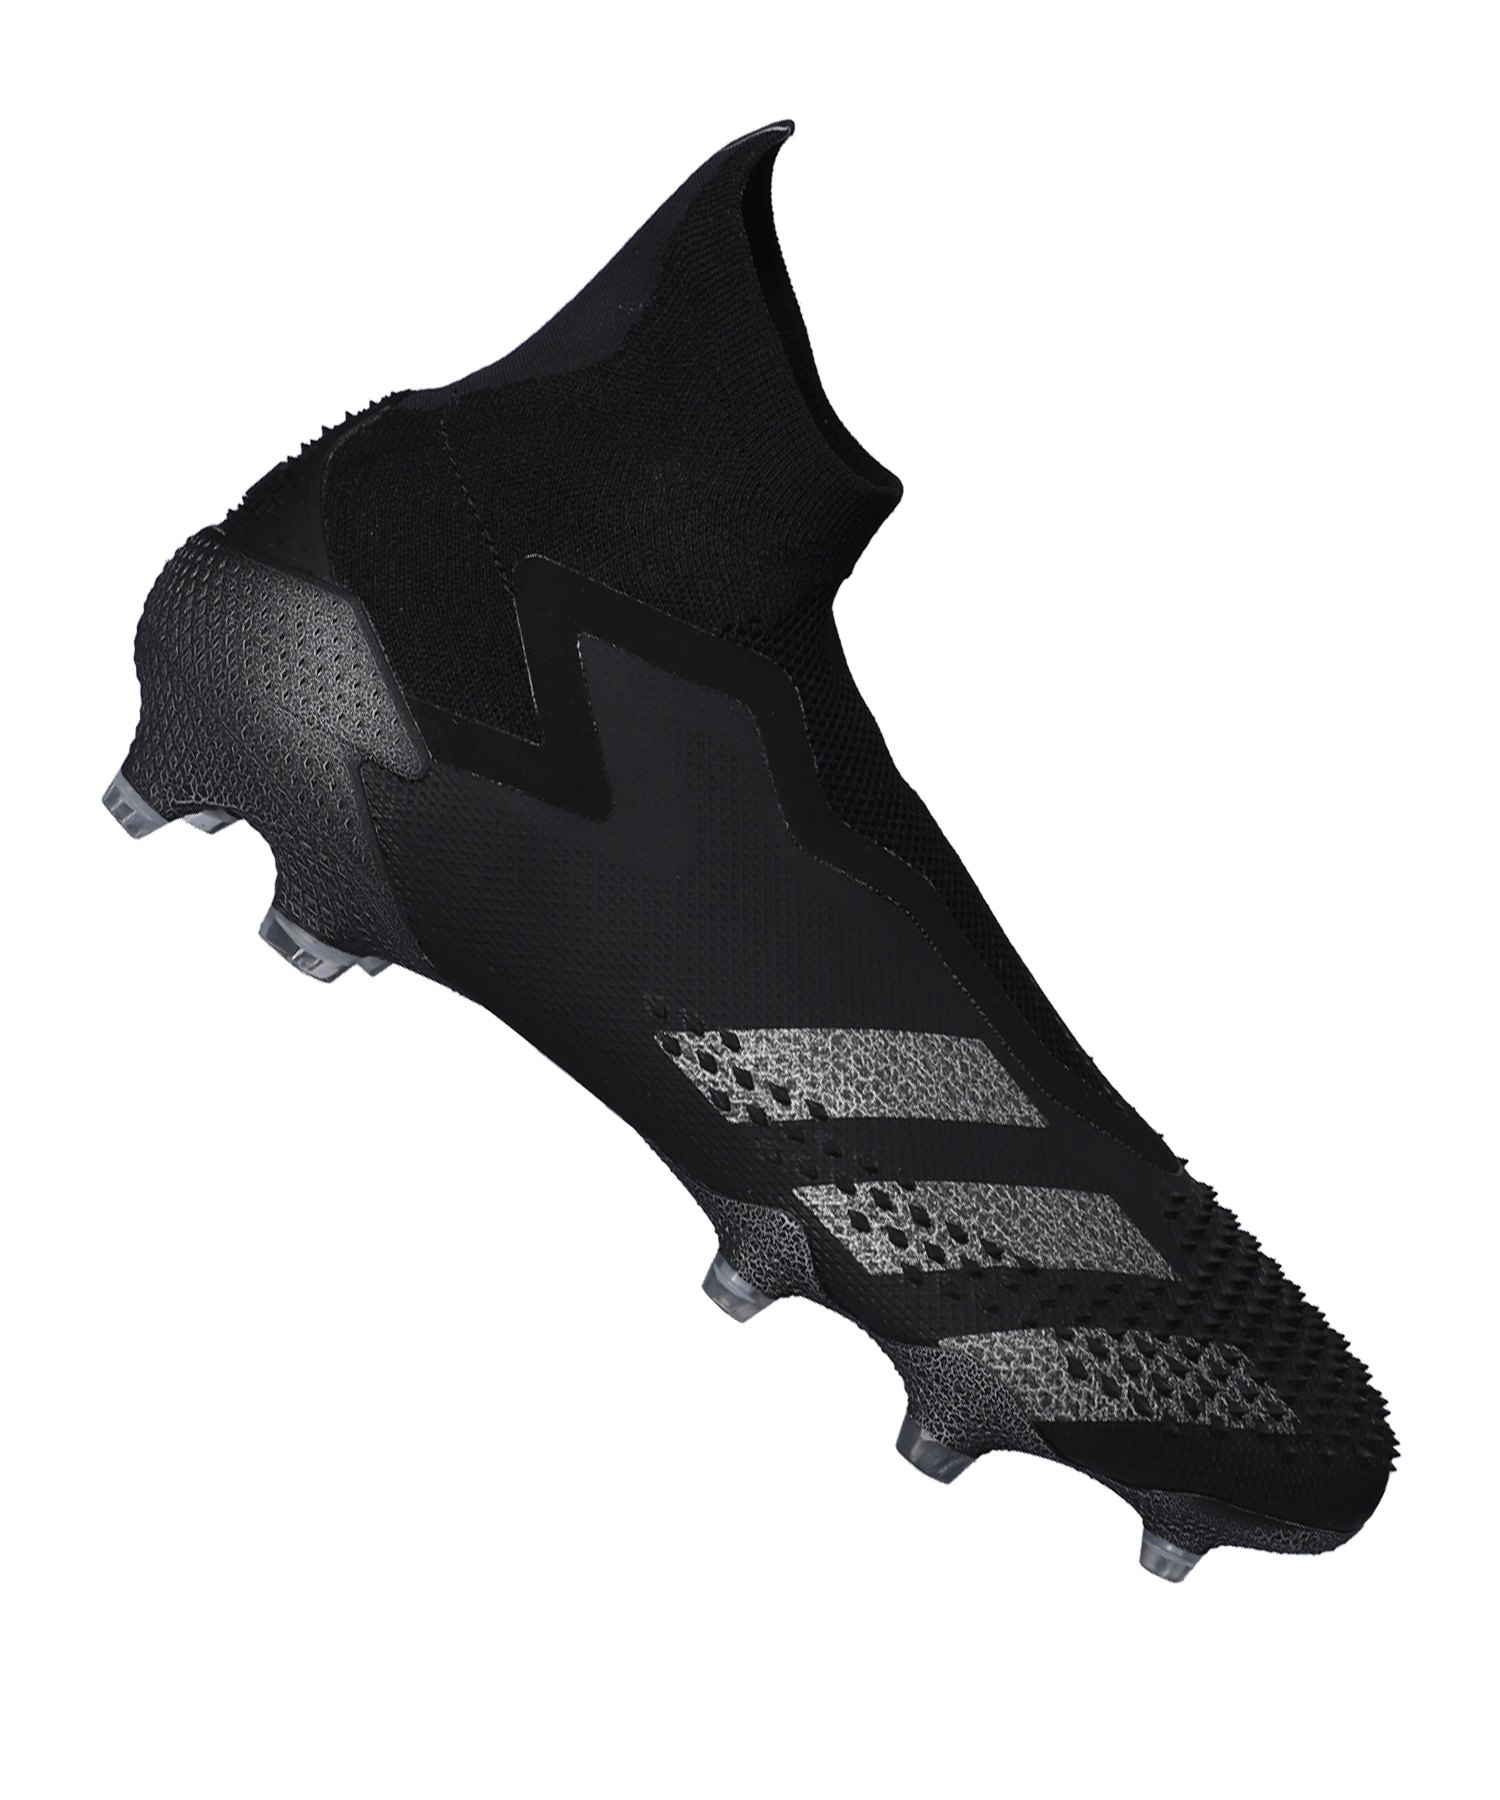 adidas Predator 20+ FG Schwarz